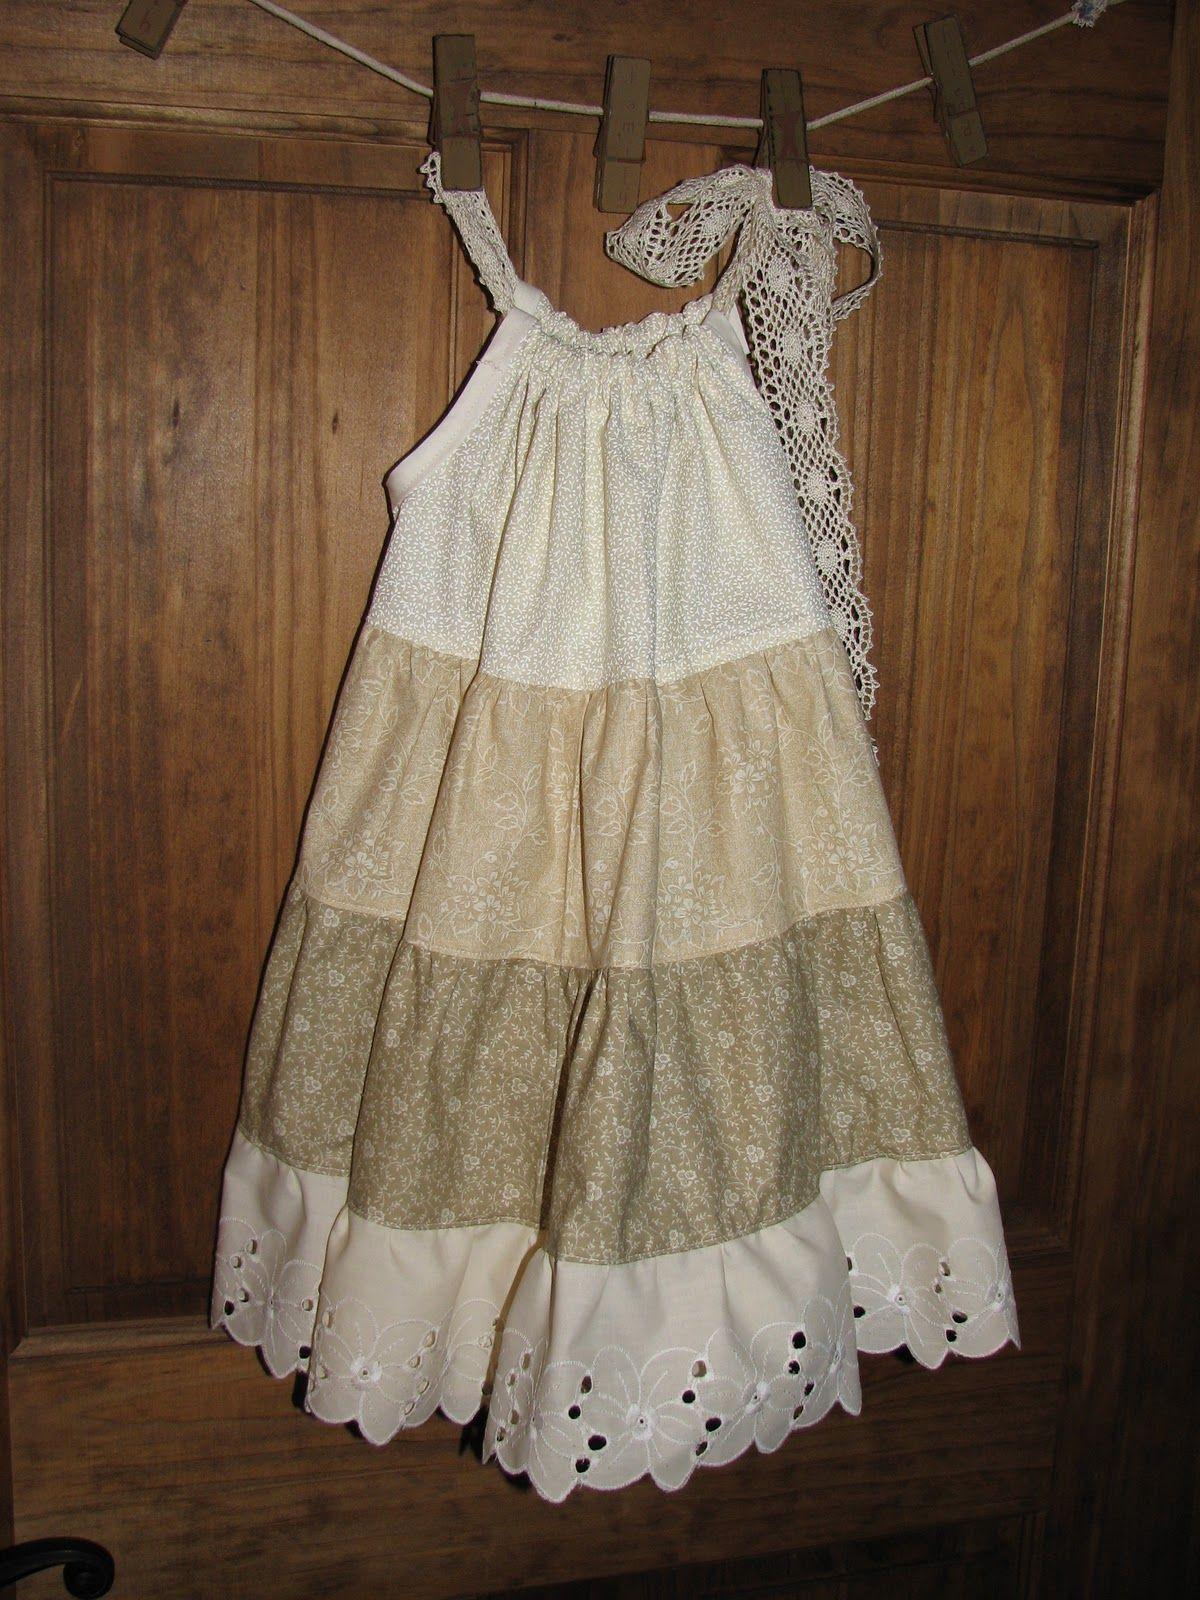 how to make a basic dress pattern